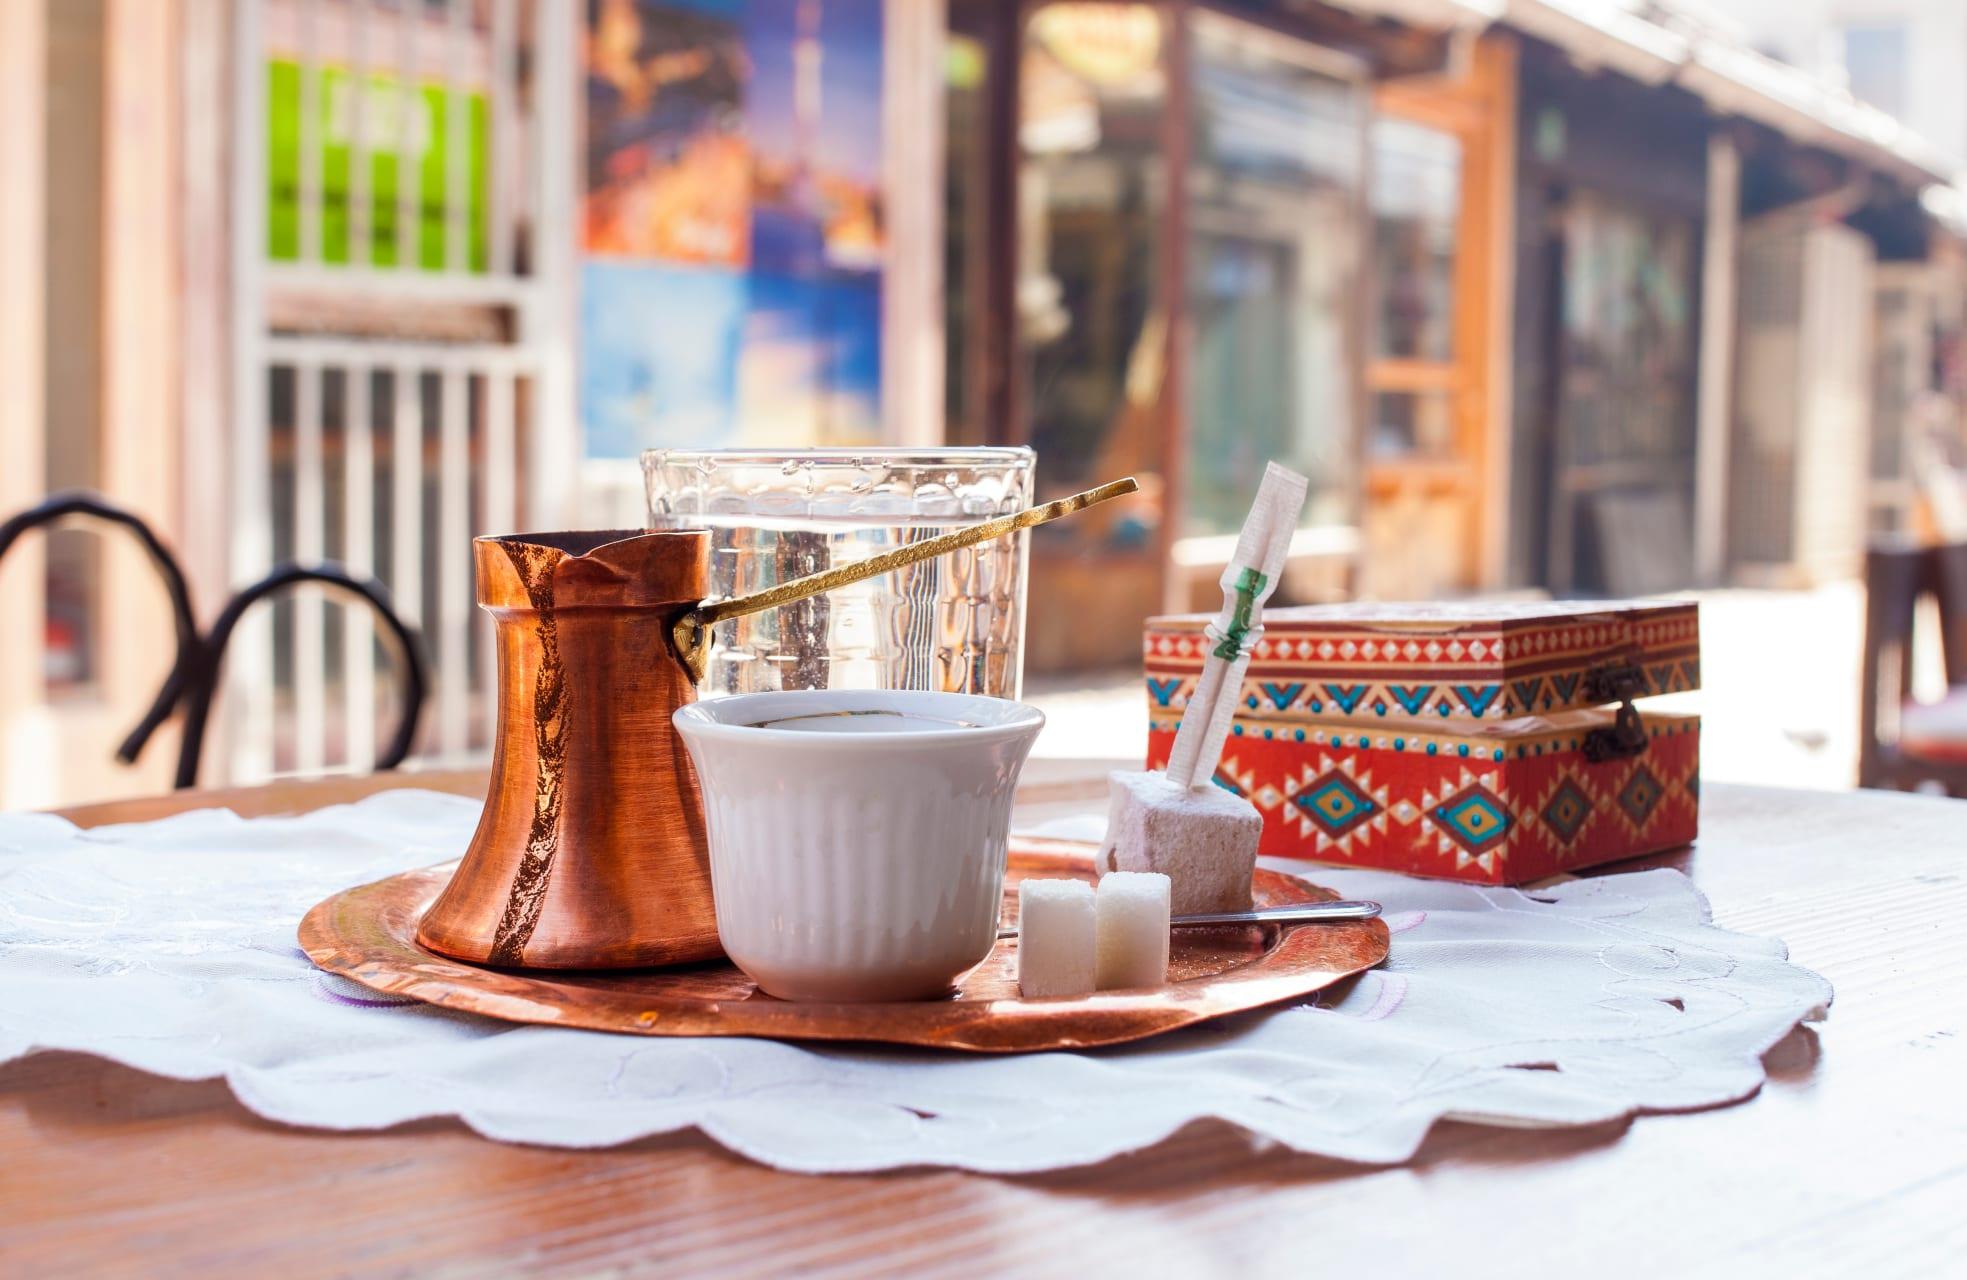 Sarajevo - The Bosnian coffee